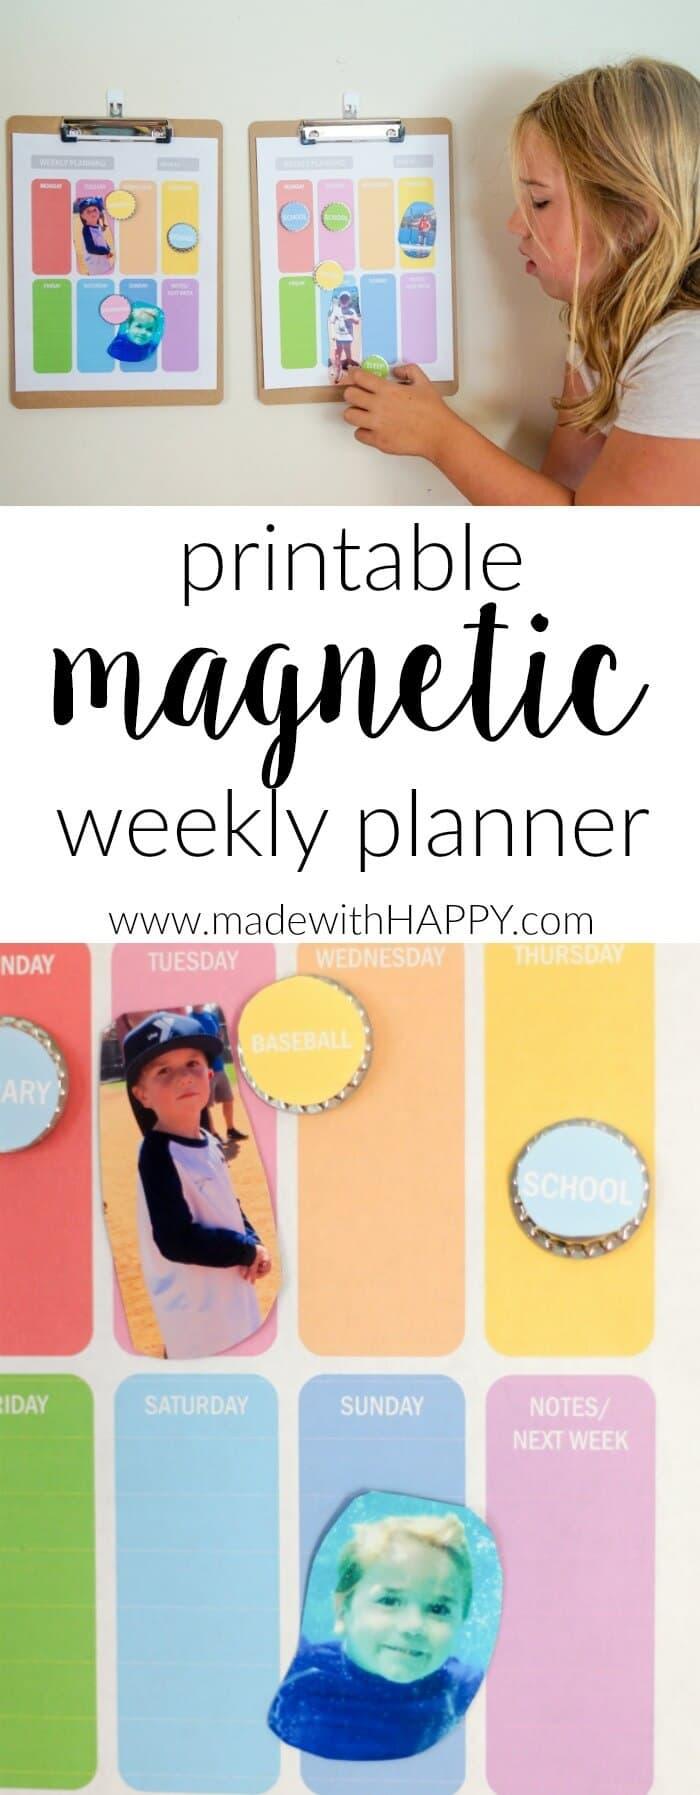 Printable Magnetic Weekly Planner .  Printable Kids Planners.  Get your kids organized this school year.  Family organization and magnetic weekly planners.